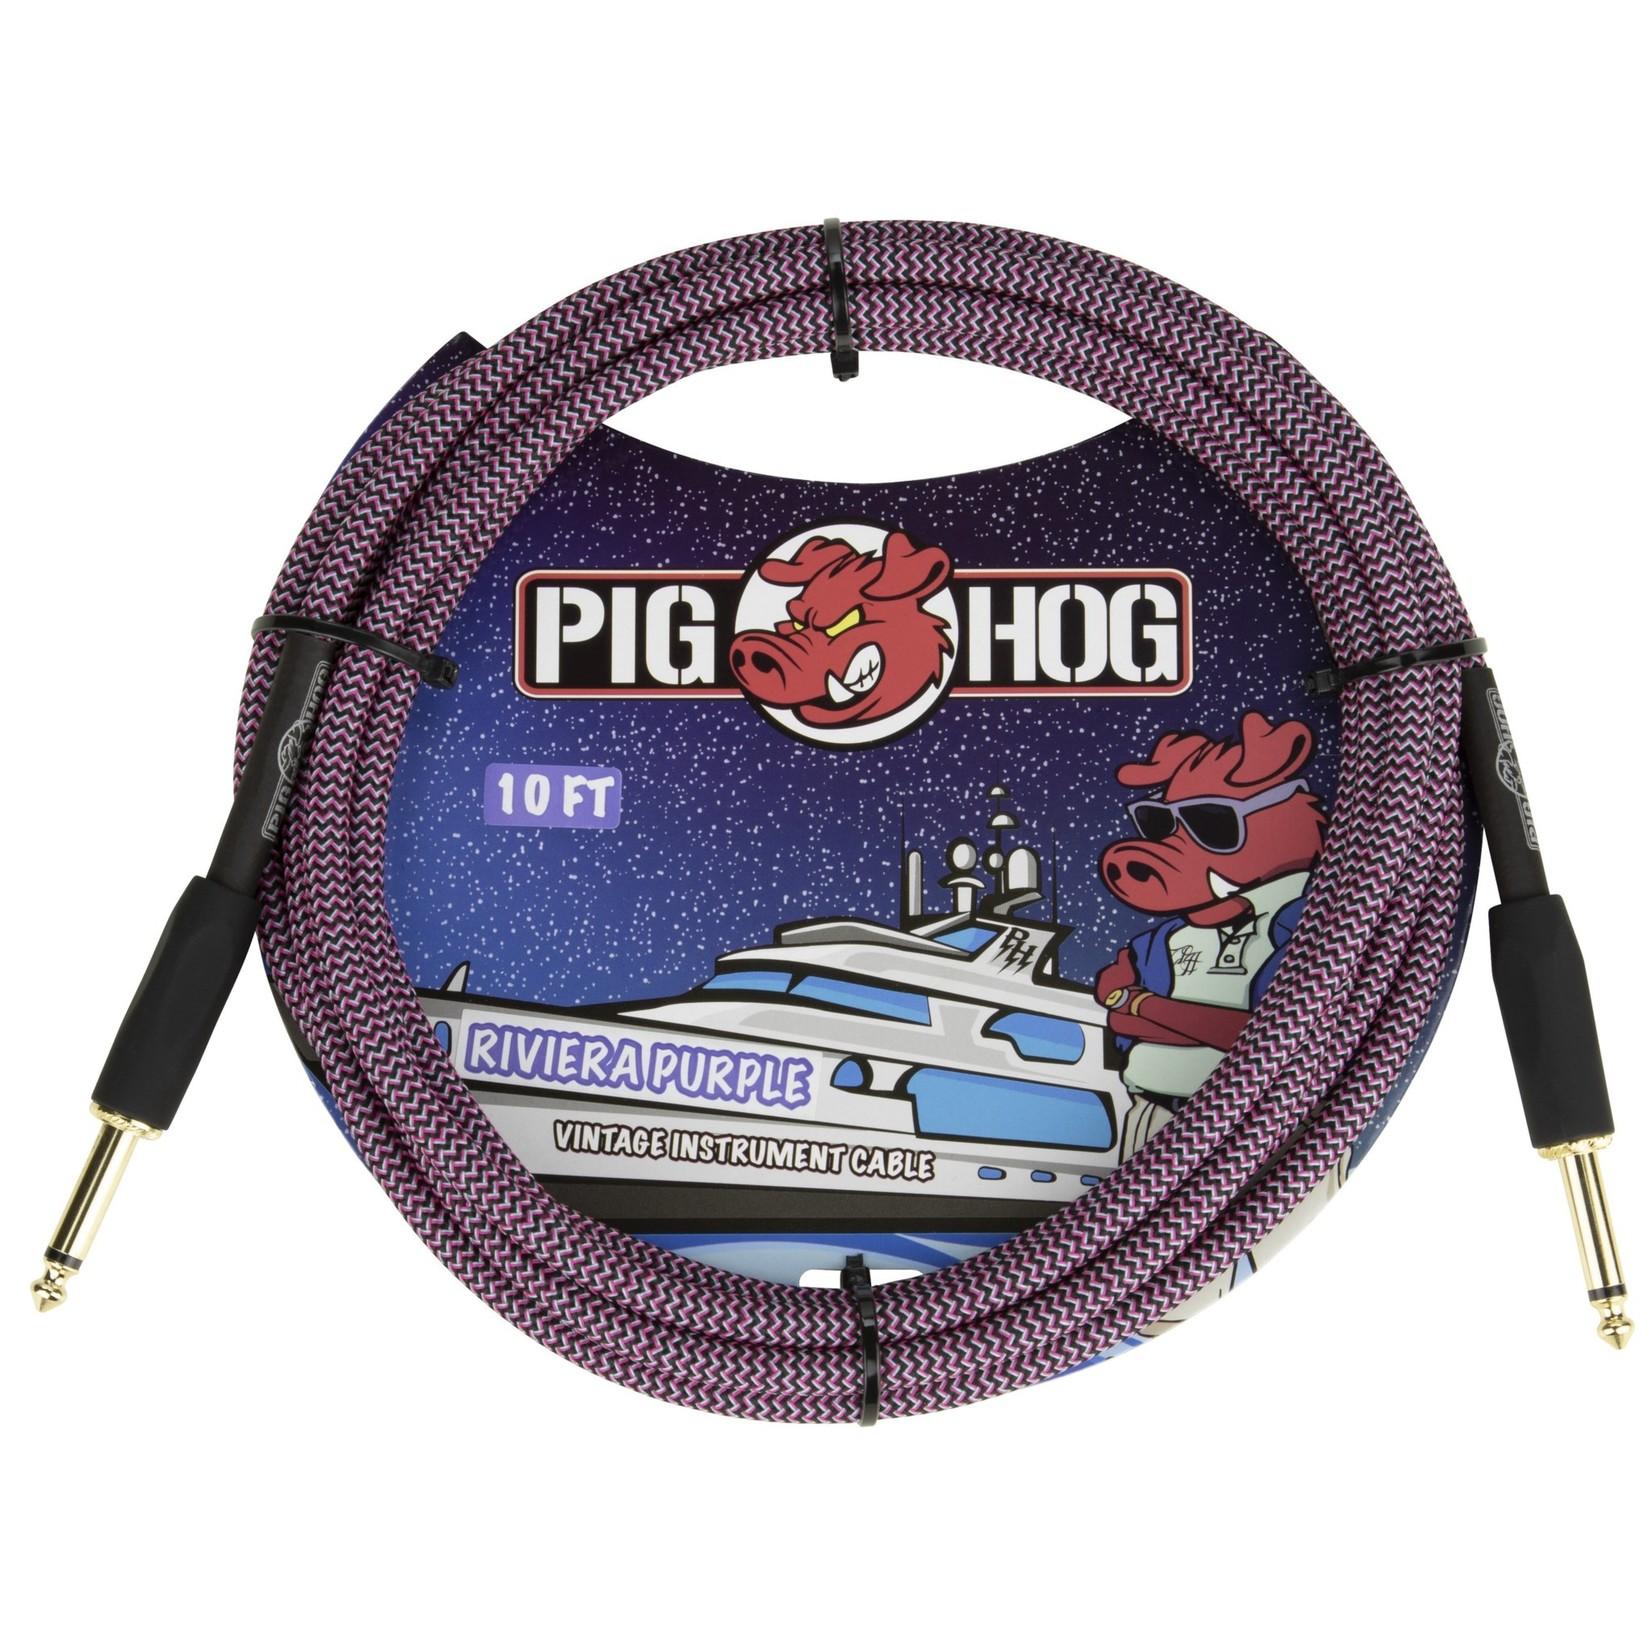 "Pig Hog Pig Hog 10-Foot Vintage Woven Instrument Cable, 1/4"" Straight-Straight Riviera Purple - New 2020!"